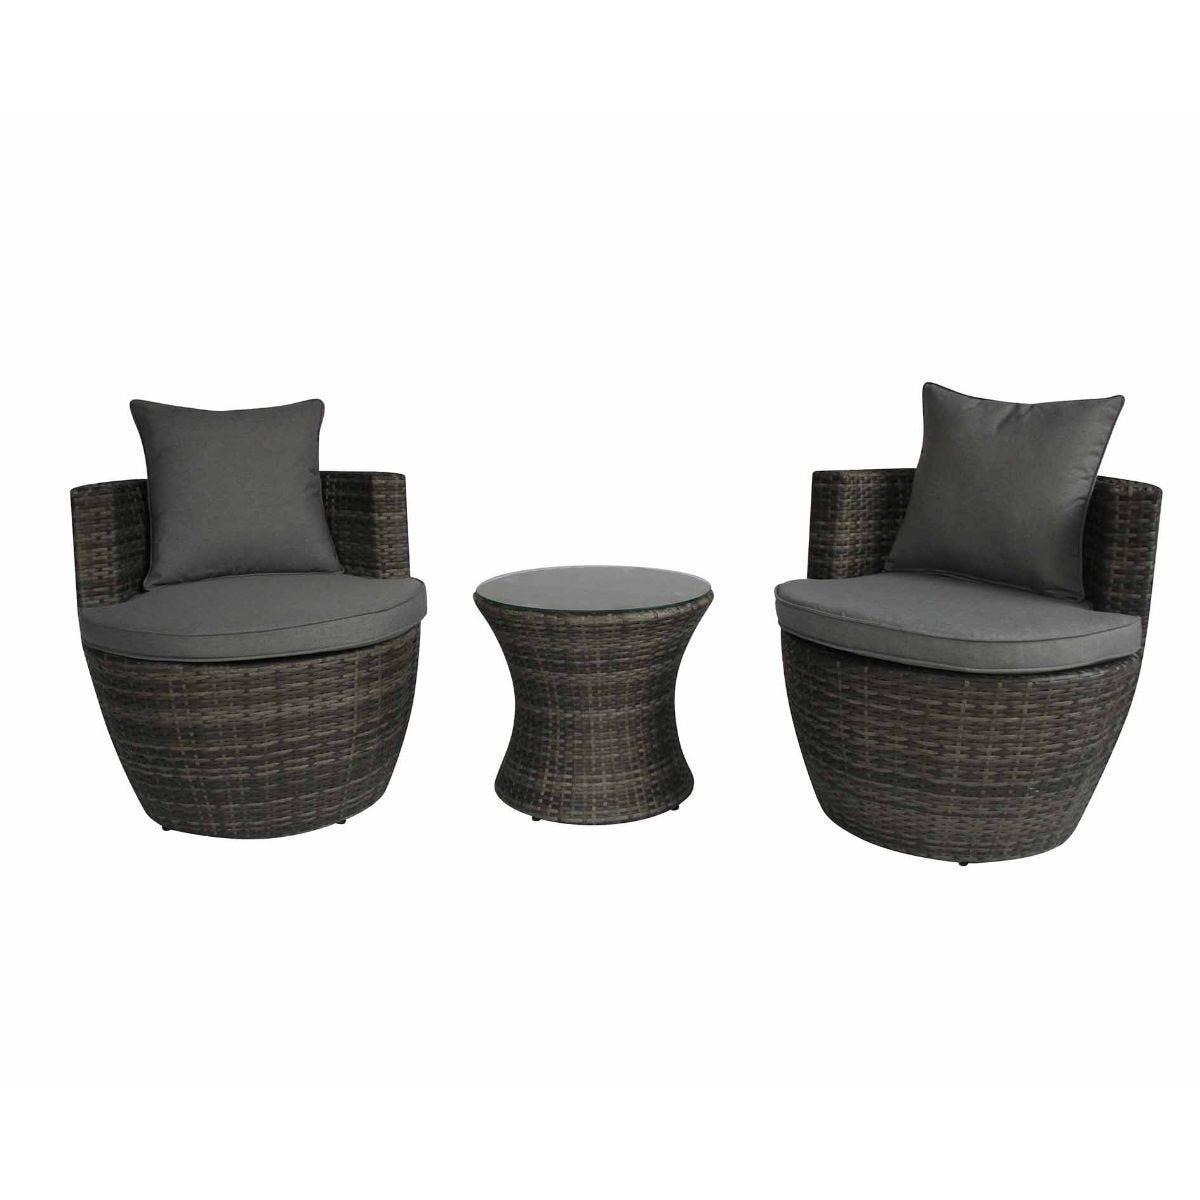 Charles Bentley Napoli Rattan Stacking 3 Piece Garden Furniture Set, Grey